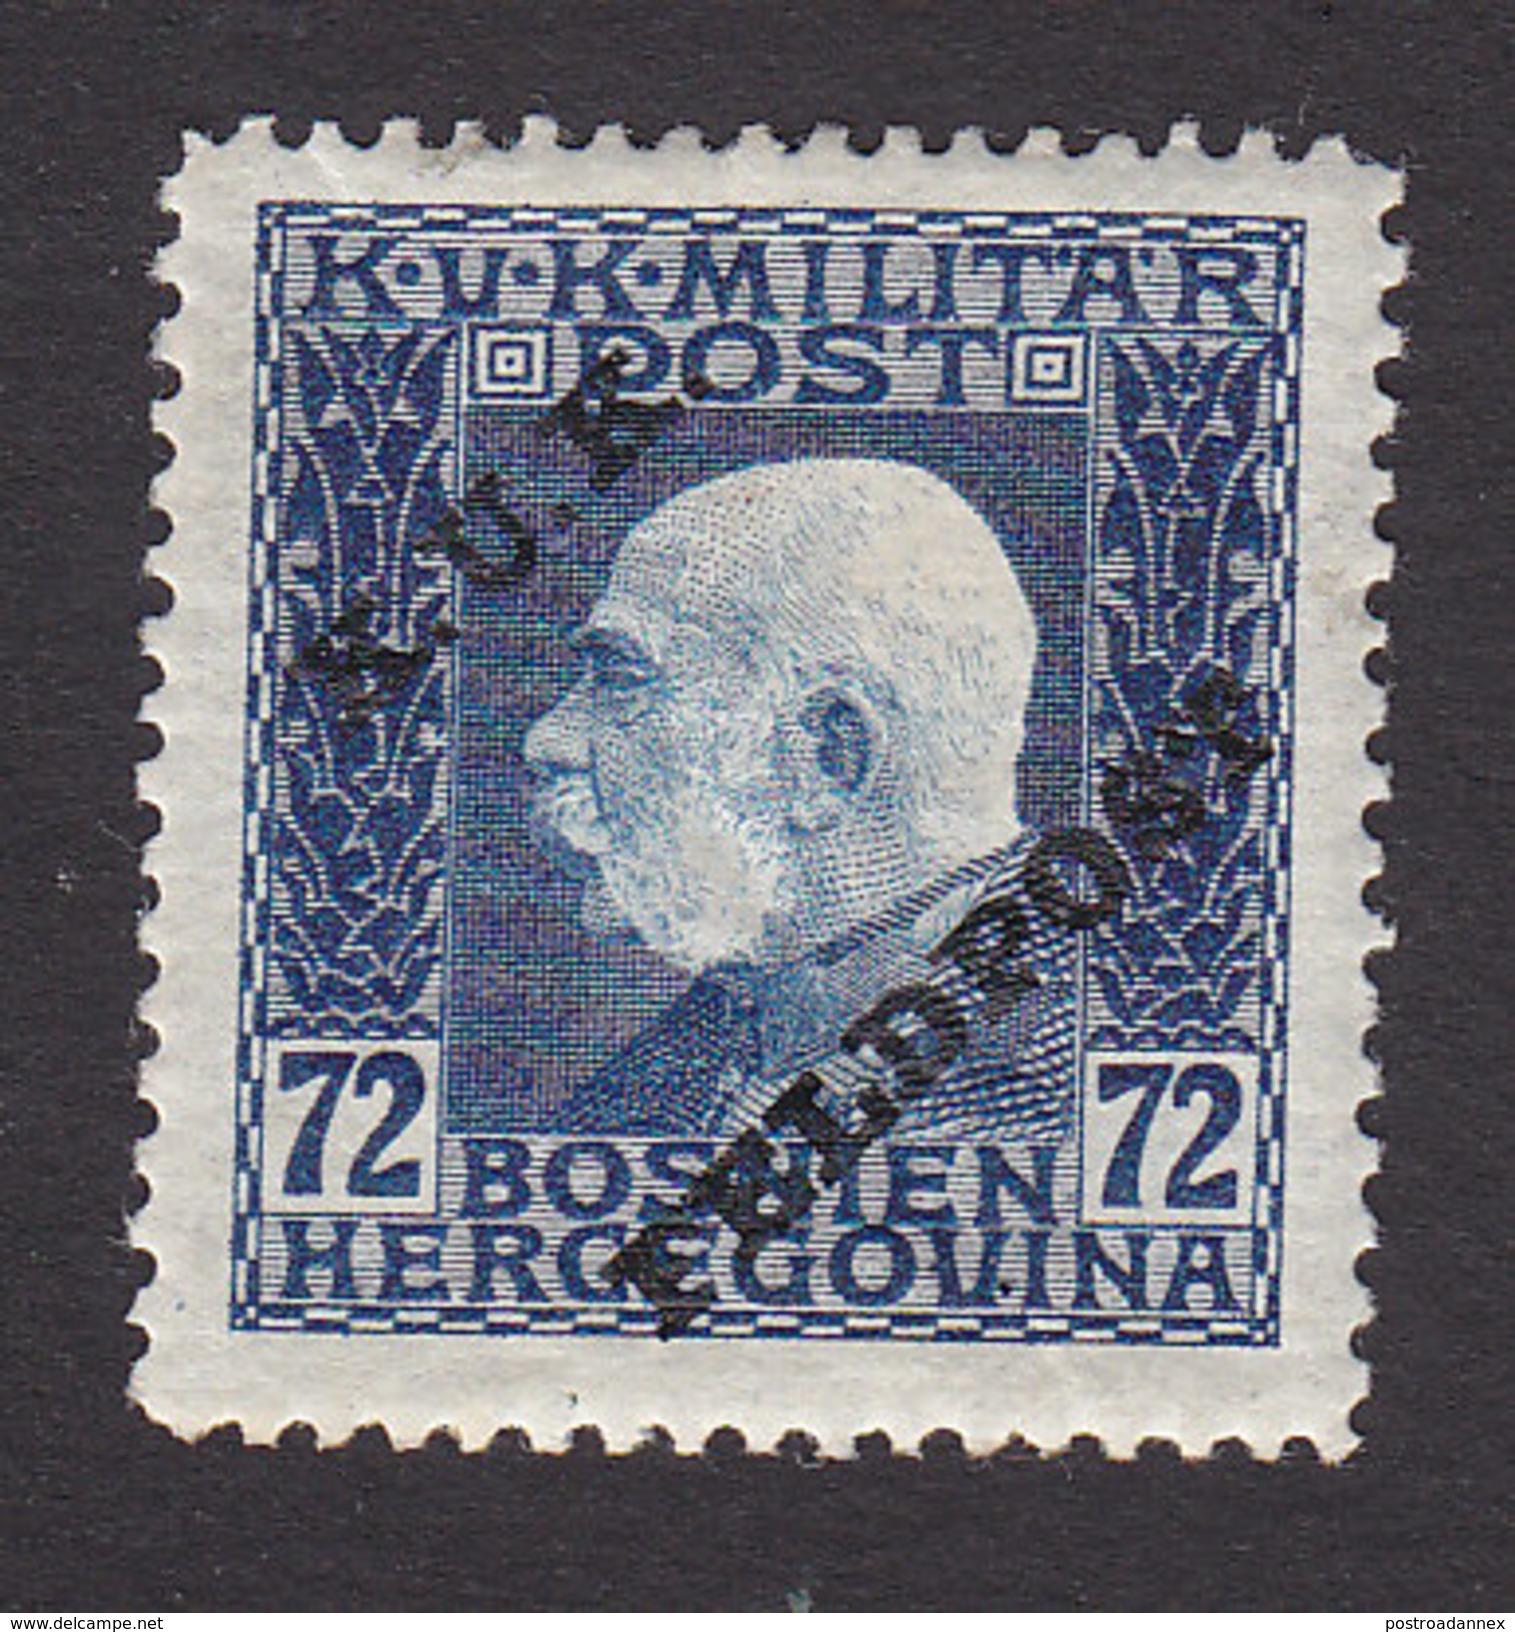 Austria, Scott #M16, Mint Hinged, Franz Josef Overprinted Military Stamp, Issued 1915 - Austria